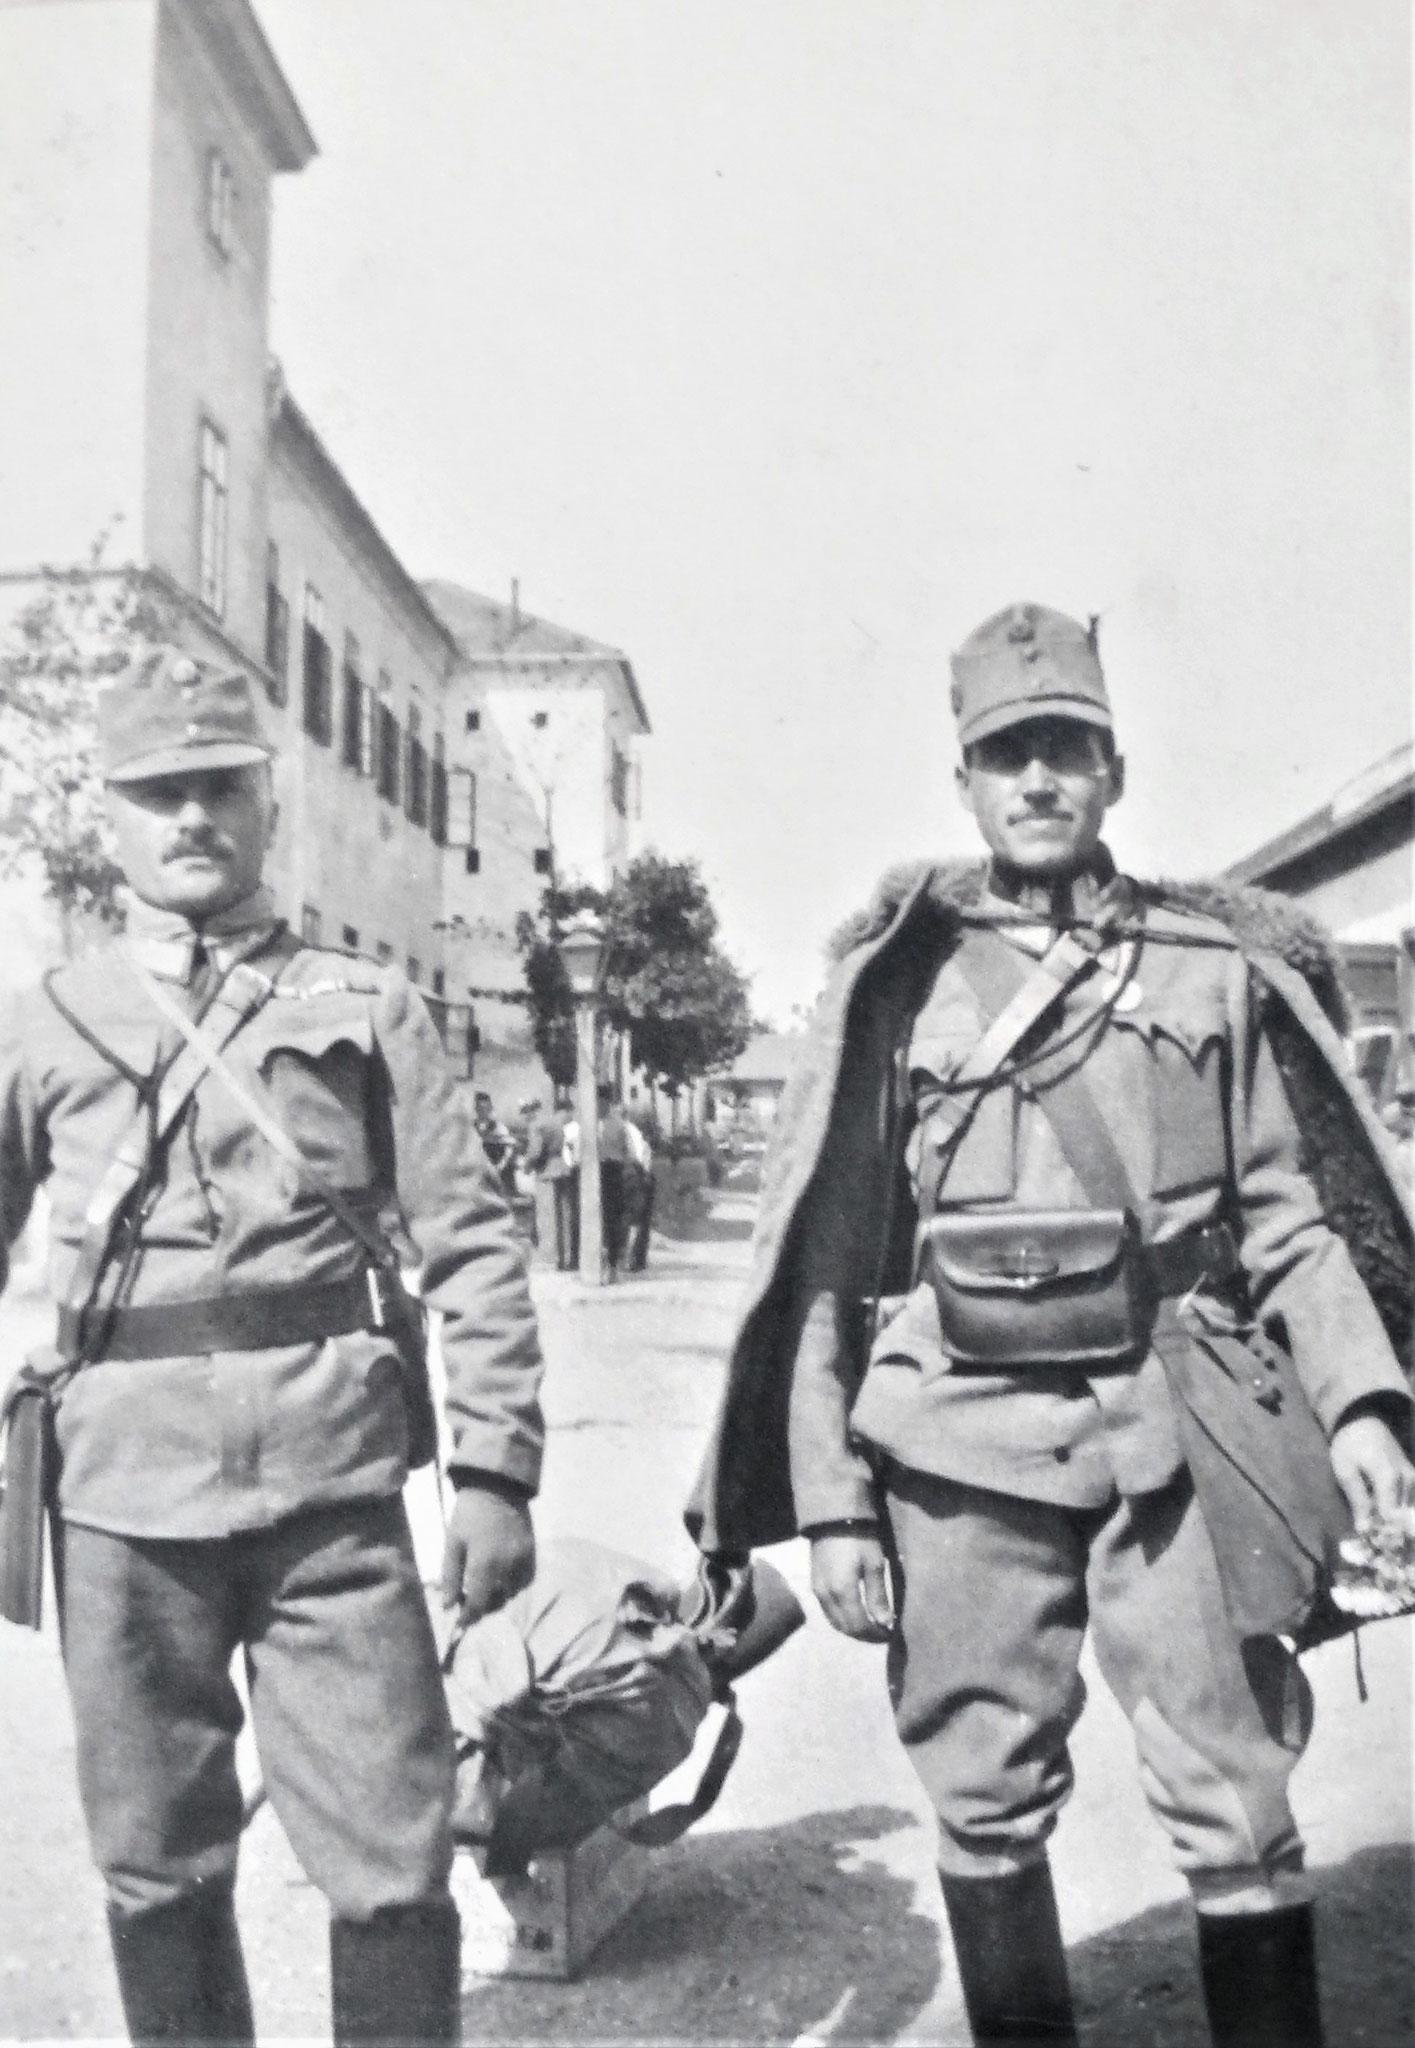 Stbwchtm. Josef Rath (6. Esk) u. Franz Kopriwa (3. Esk). Vor Wiederabgehen ins Feld in Marburger Kavalleriekaserne.